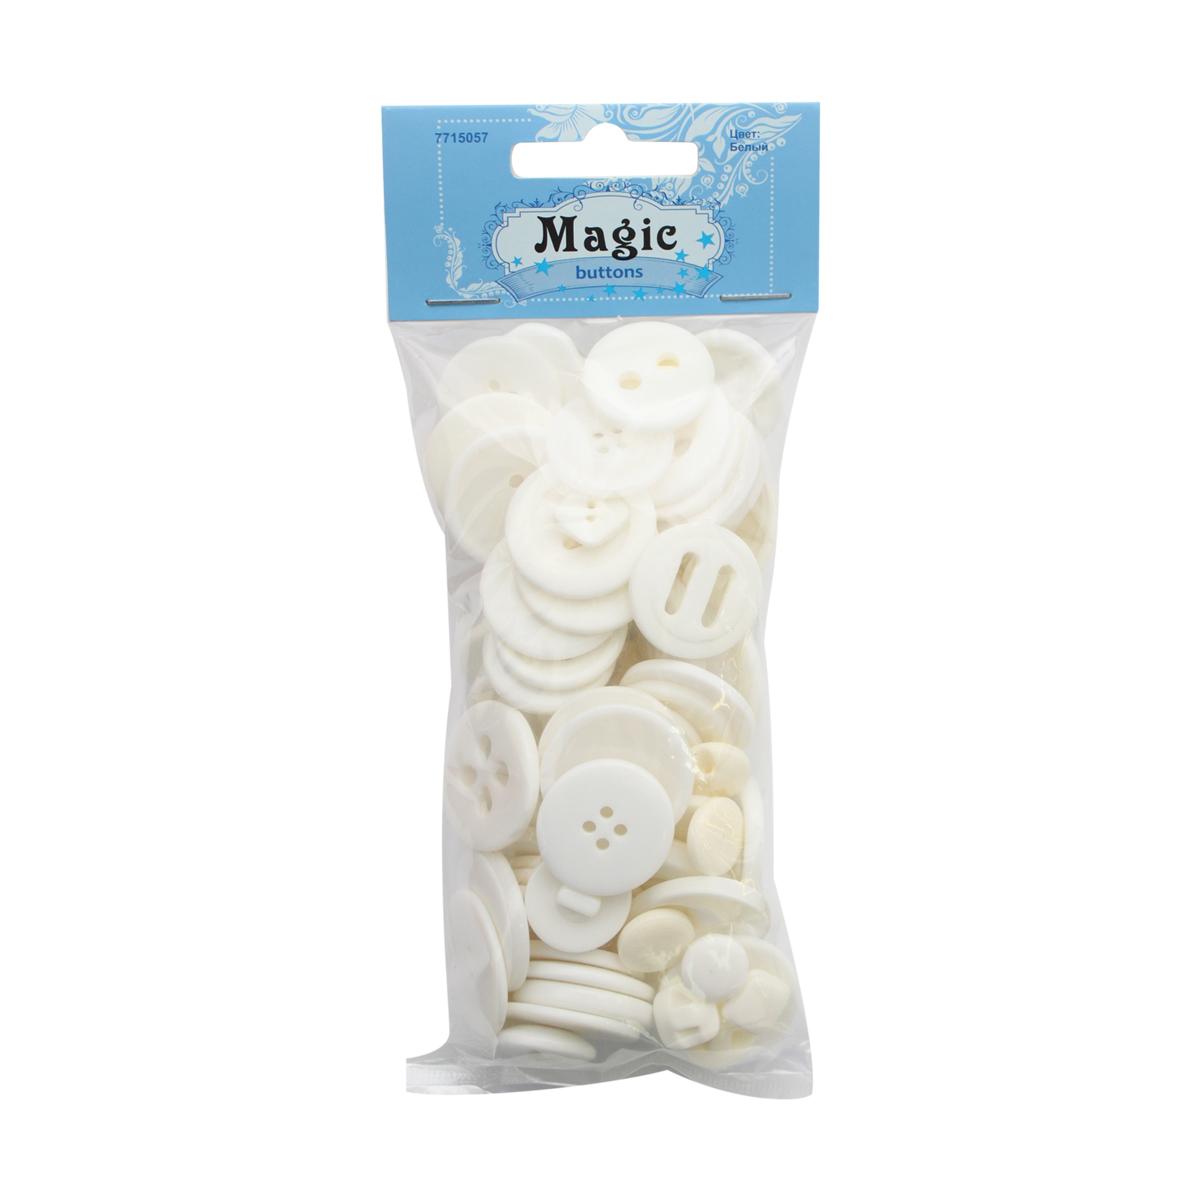 �������� ������������ Magic Buttons �������, ����: �����, 100 �7715057_���������� � ��������� �������� Magic Buttons ������ ���������� ����������� � ������ ������. �������� ��������� � ������ �������� ��������� � ������.